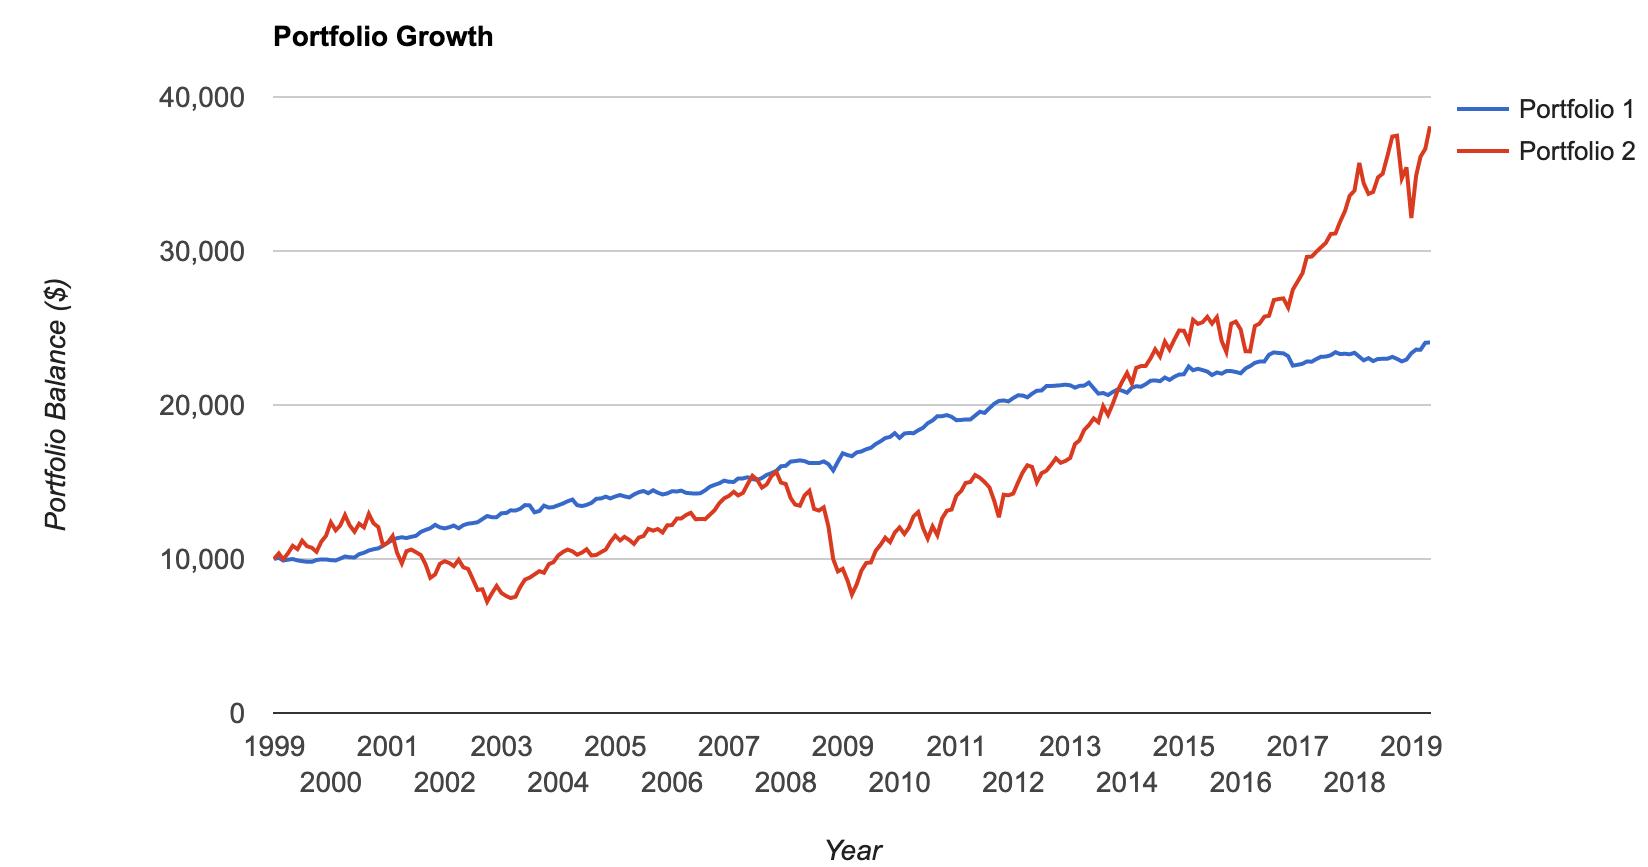 Stocks versus bond performance